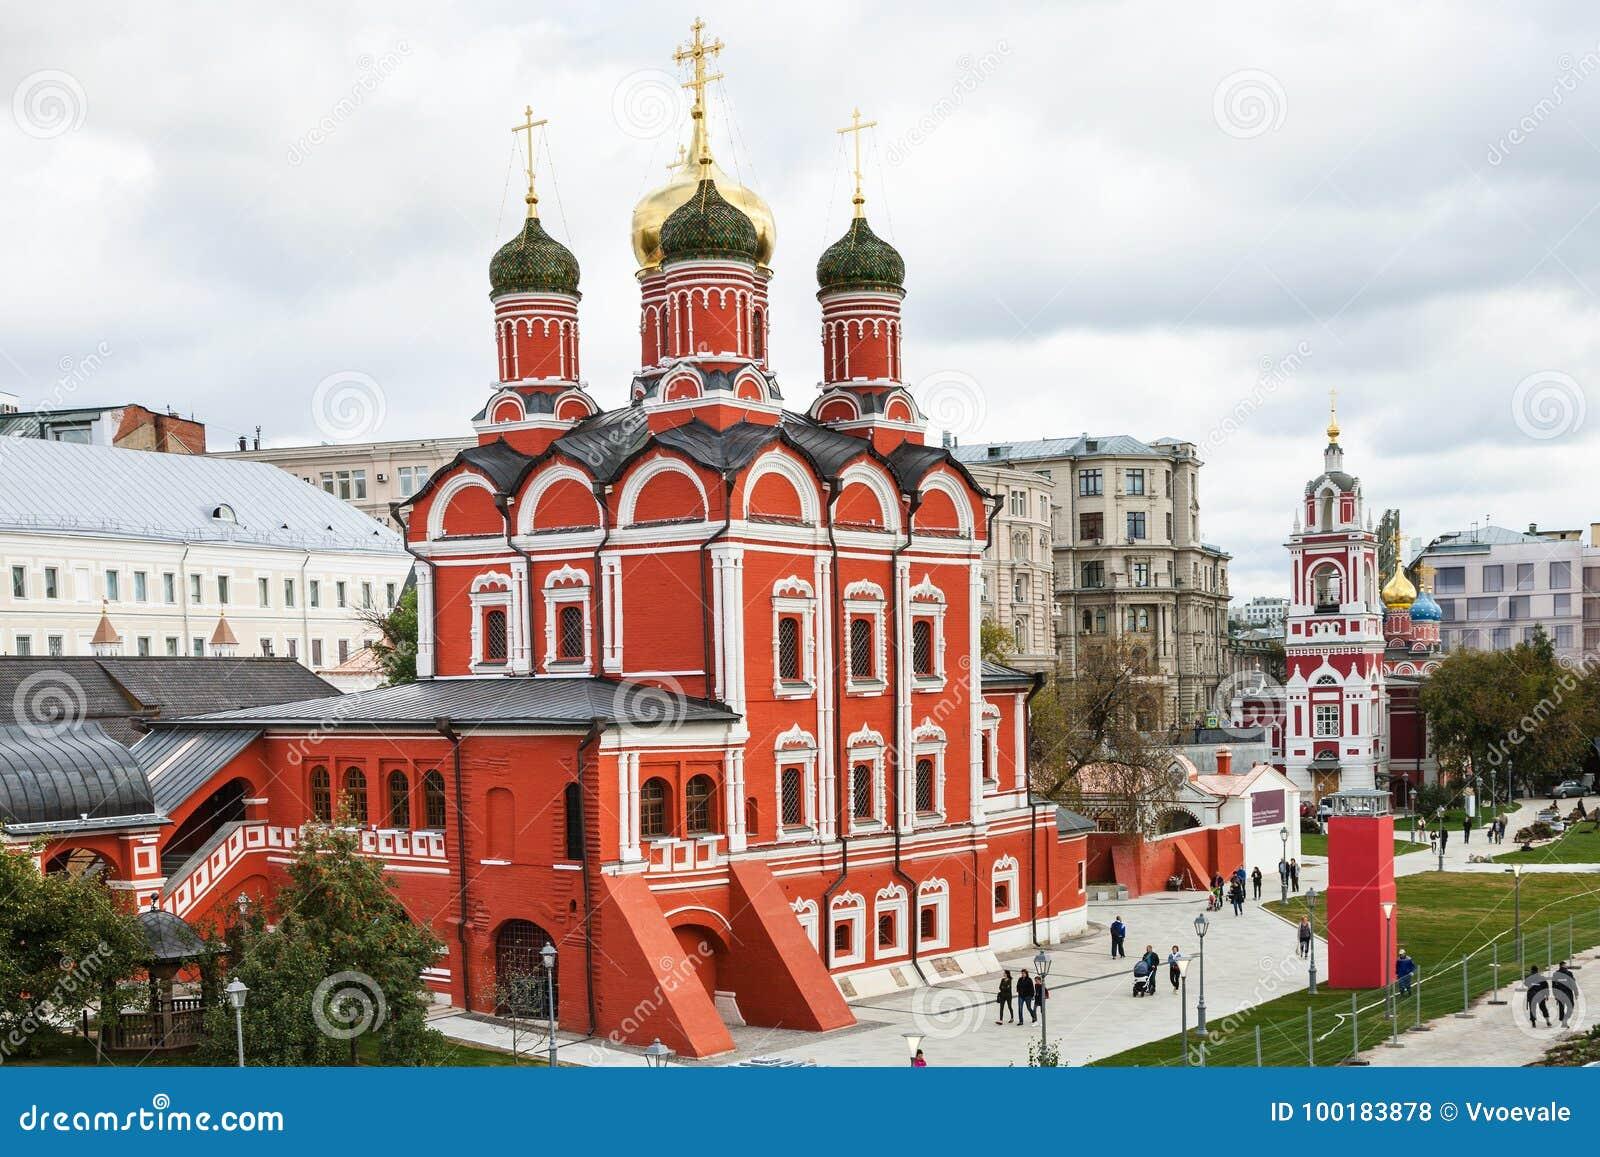 Znamensky Monastery in Romanov Chambers in Moscow